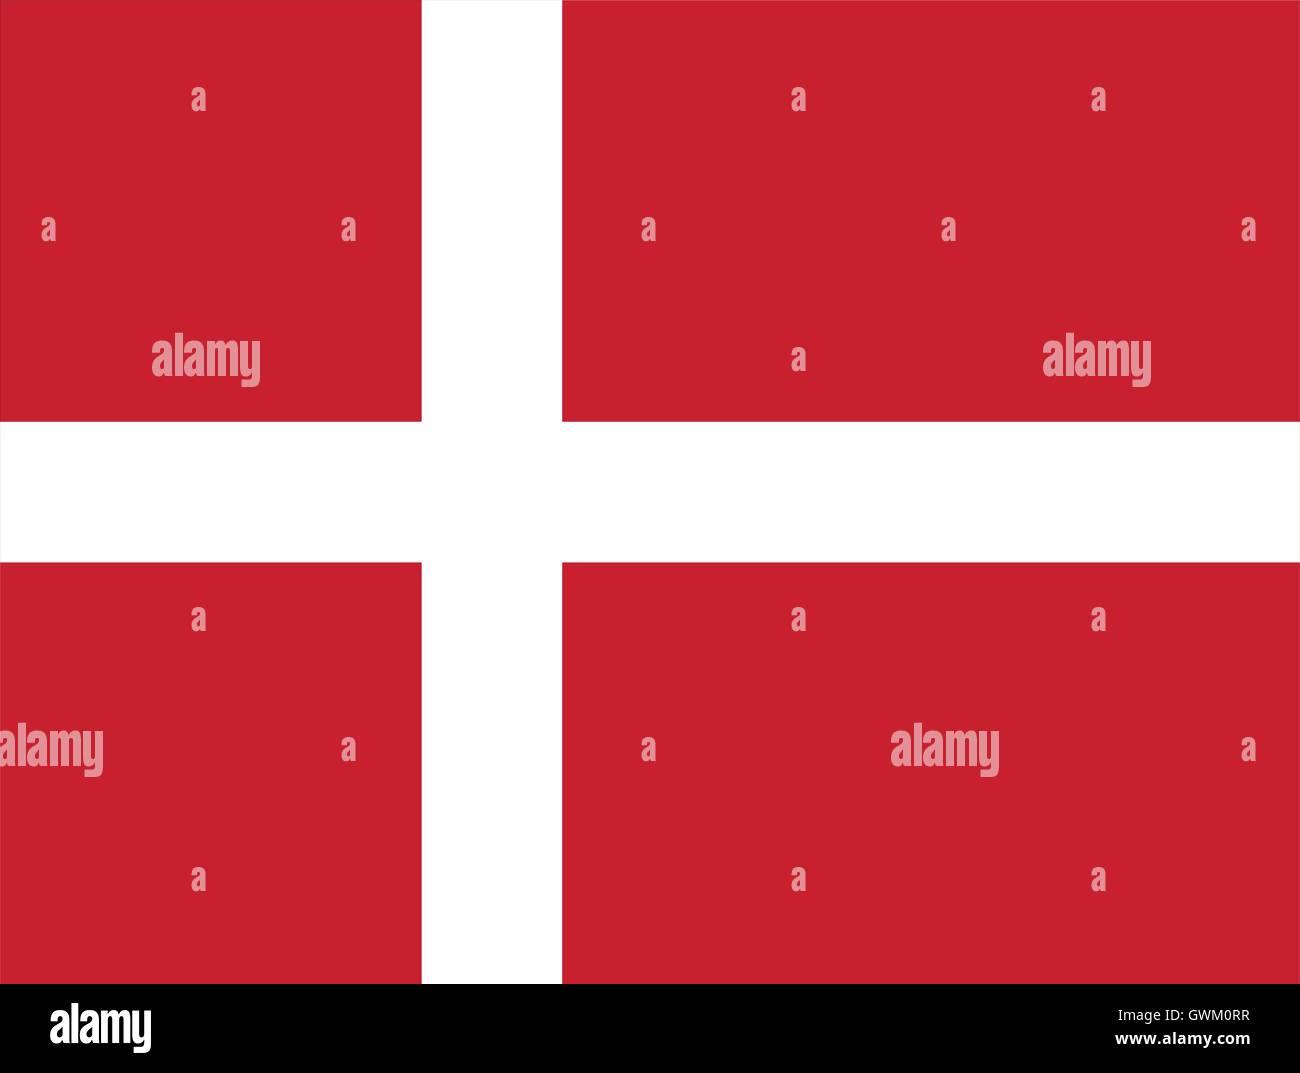 Denmark flag, accurate vector illustration, official colors, correct proportion. - Stock Vector